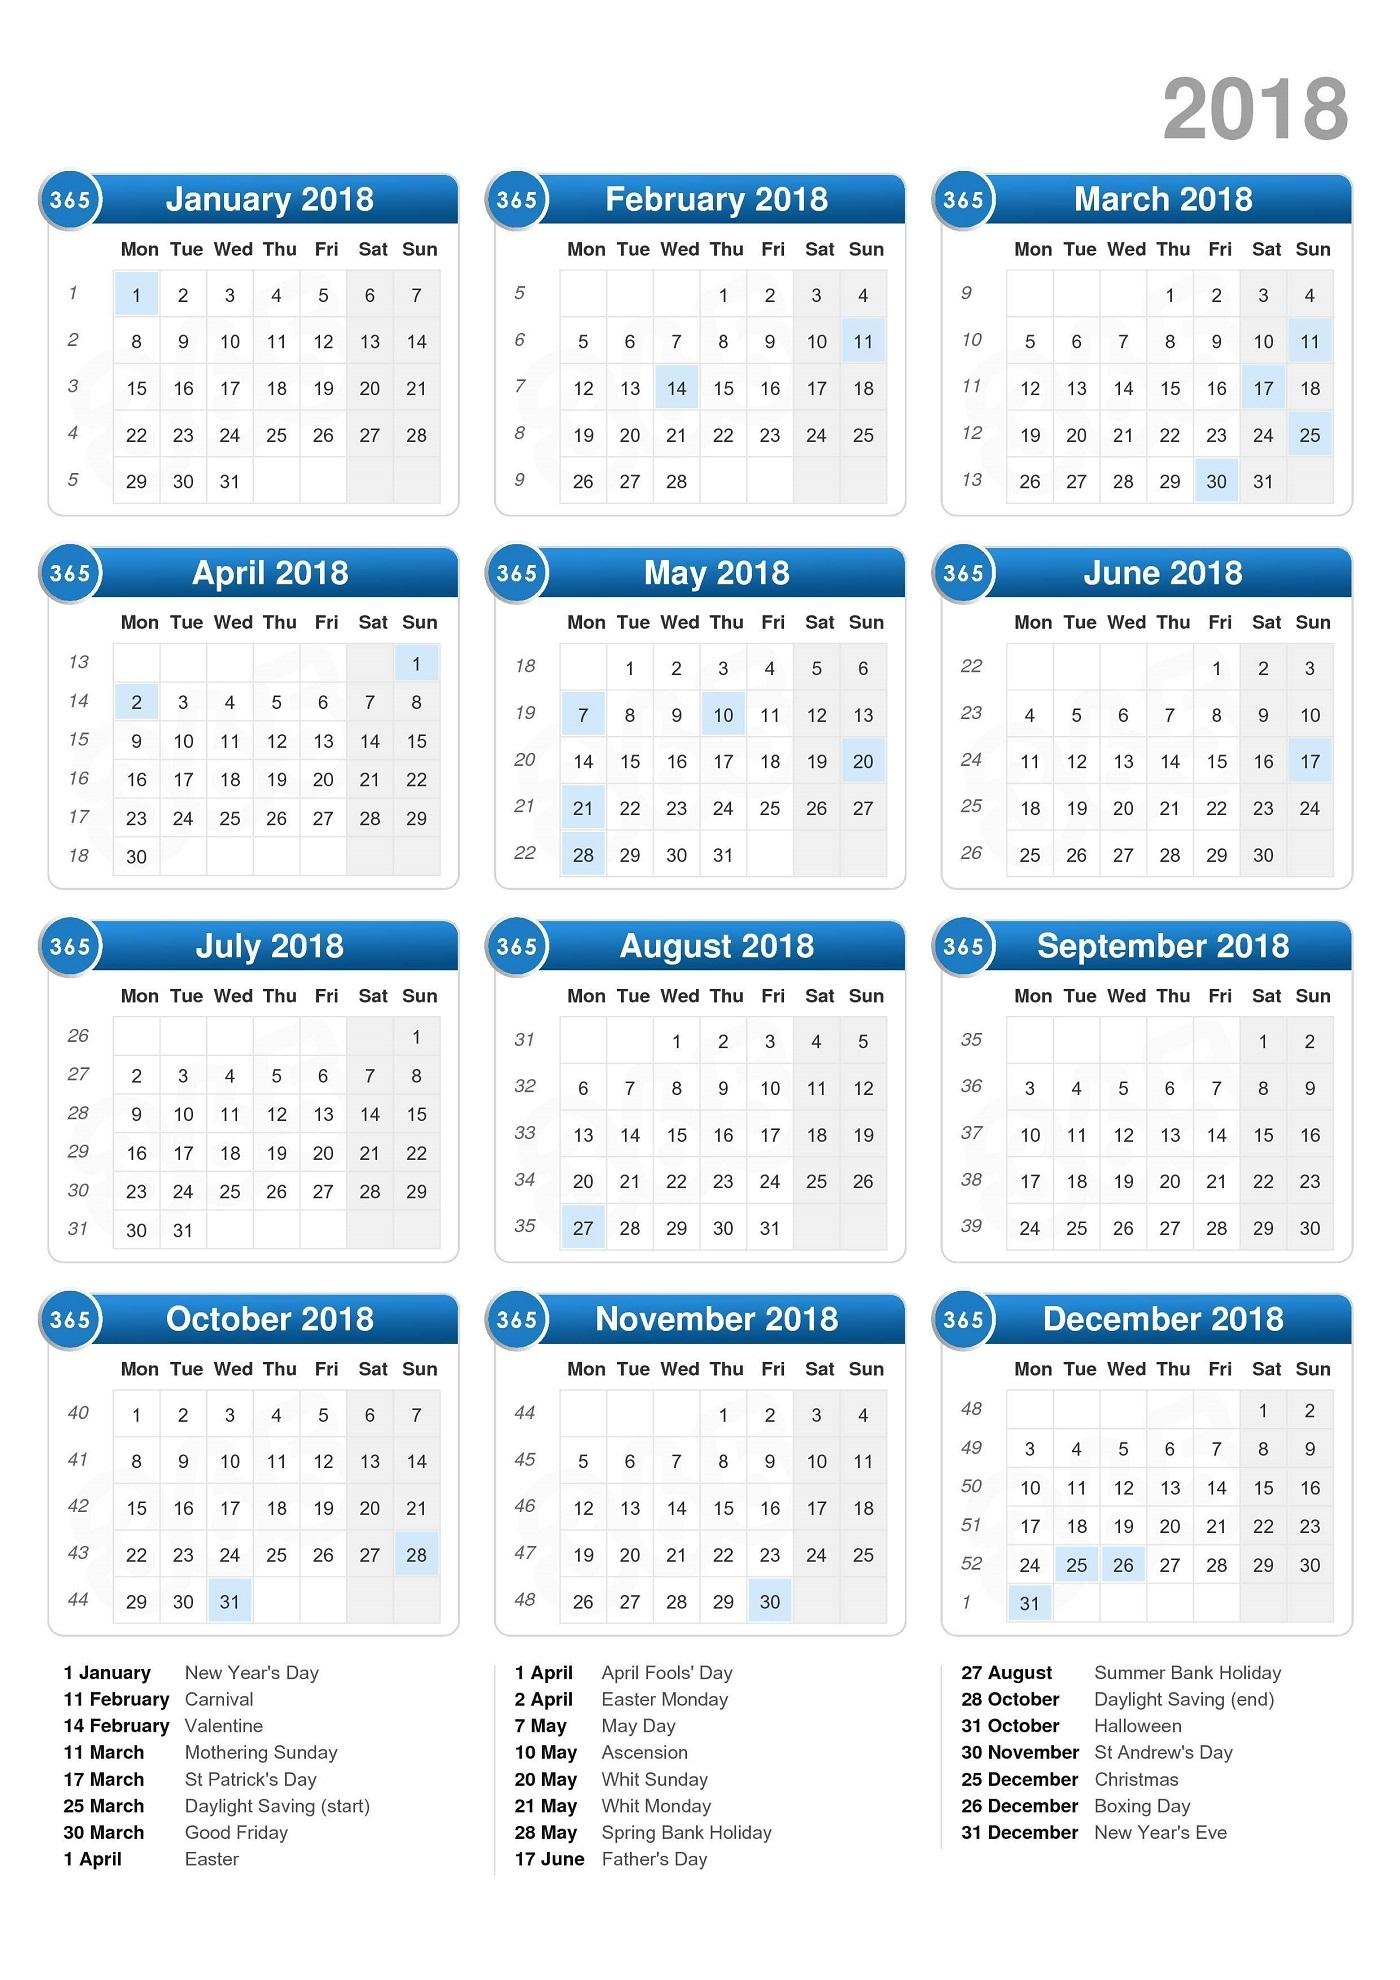 free calendar 2018 image